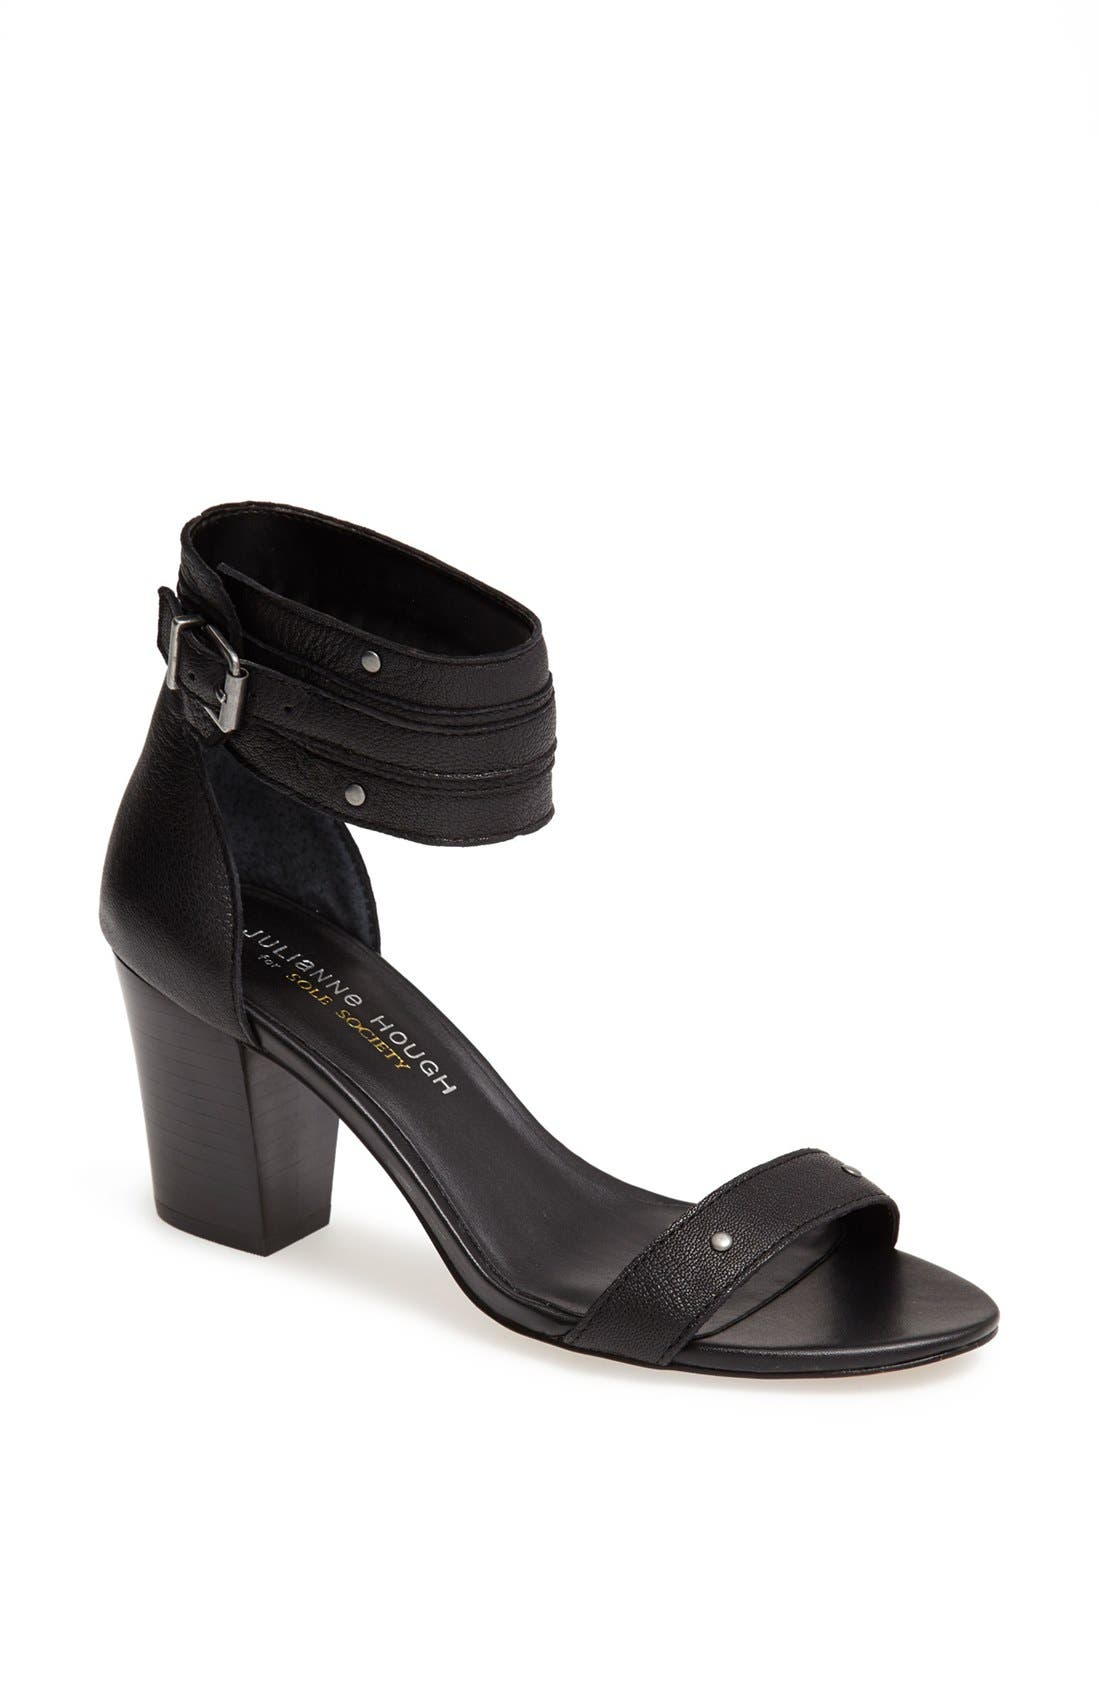 Alternate Image 1 Selected - Julianne Hough for Sole Society 'Rochelle' Sandal